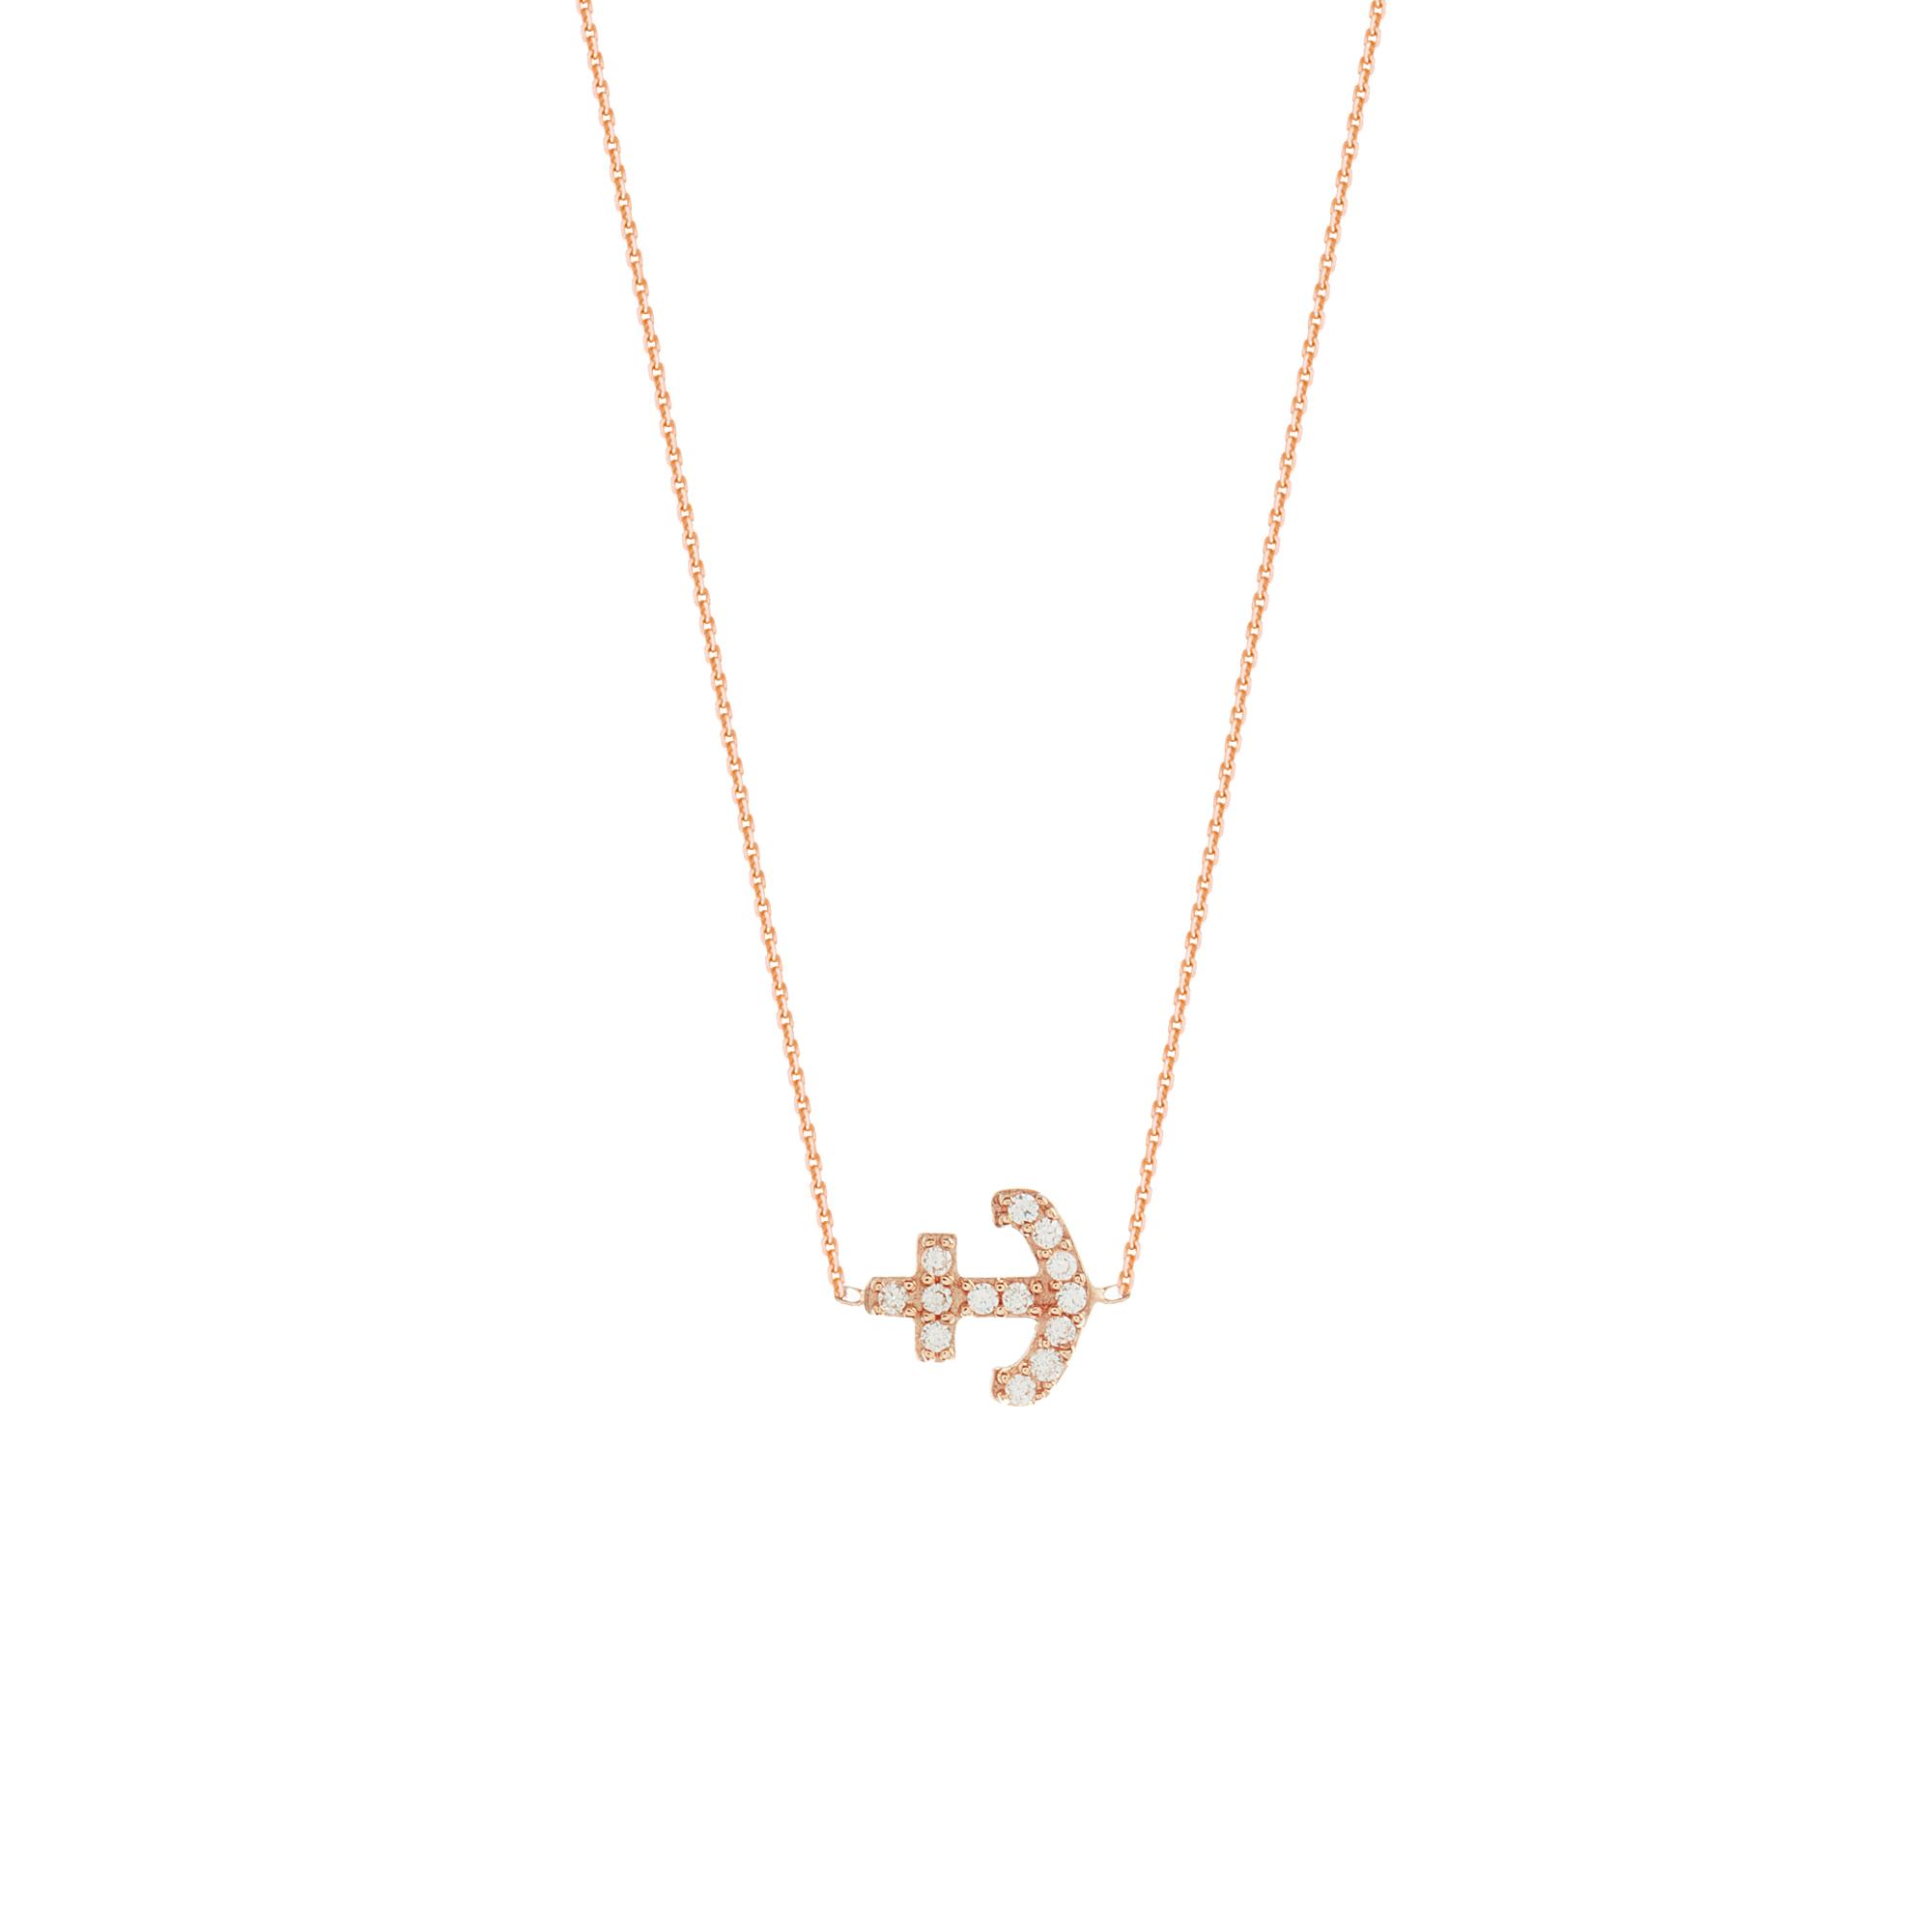 Anchor Necklace, 14Kt Gold Cz Anchor Necklace 18